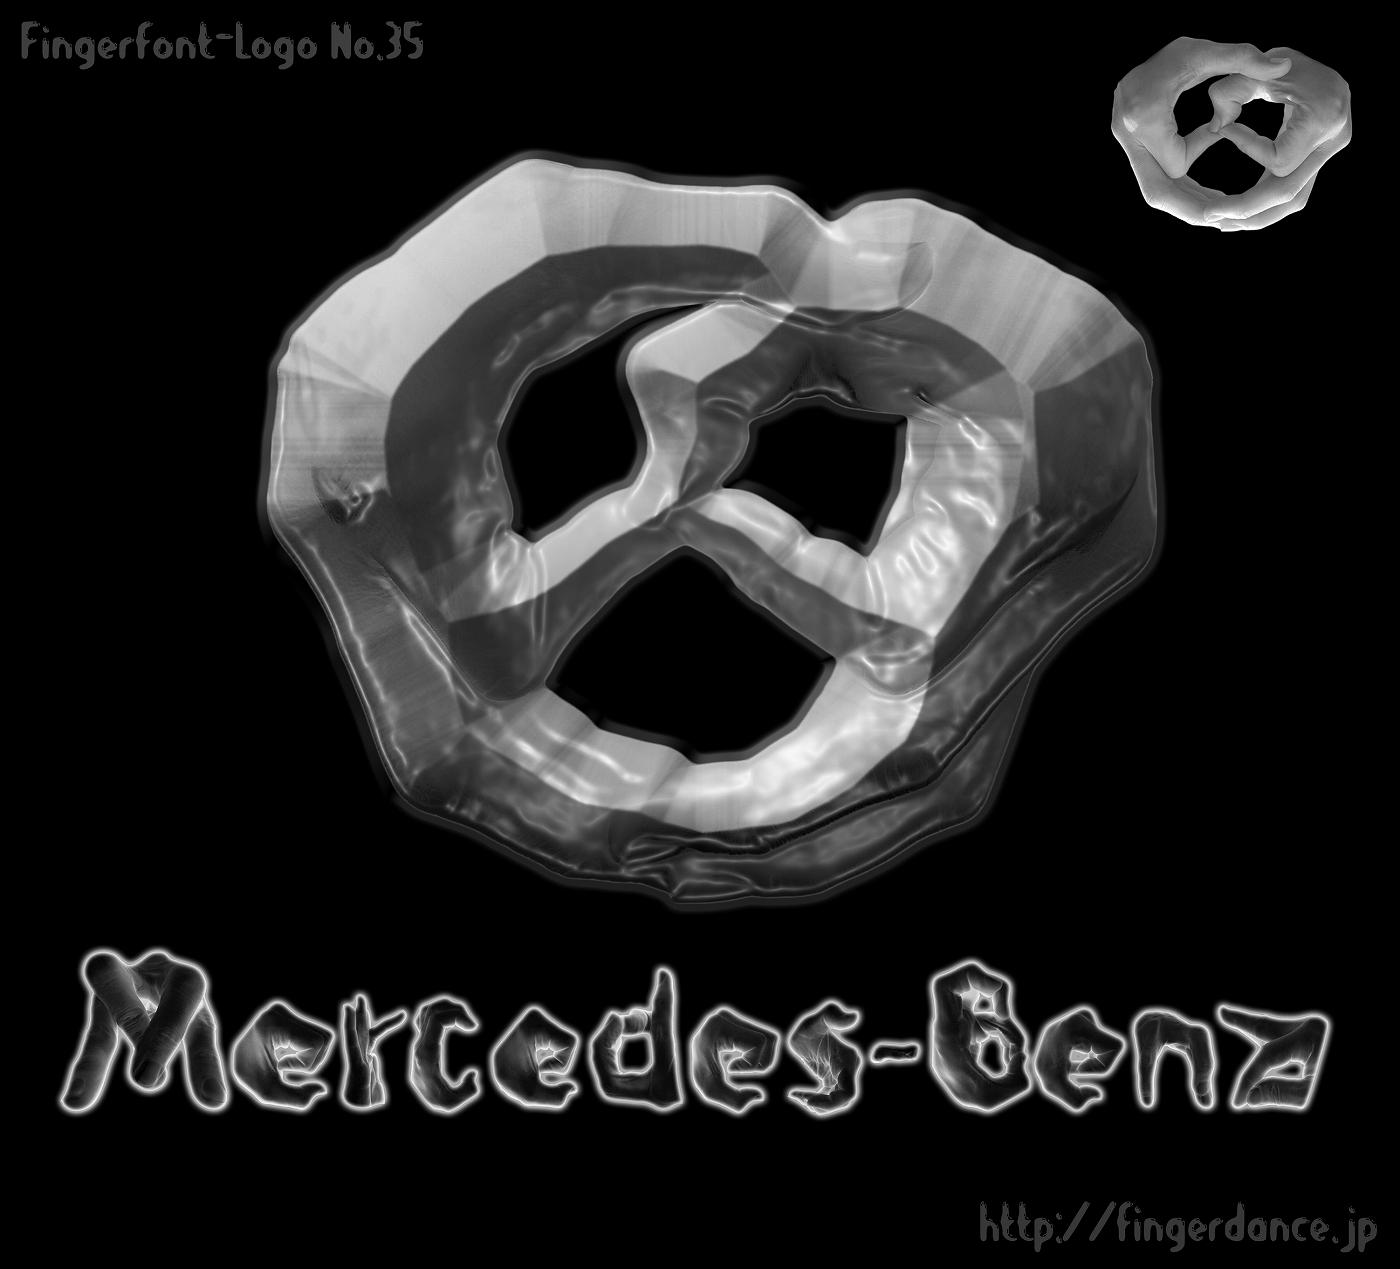 Mercedes-Benz-fingerhttp://fingerdance.jp/L/logohand メルセデスベンツフィンガーロゴハンド手指